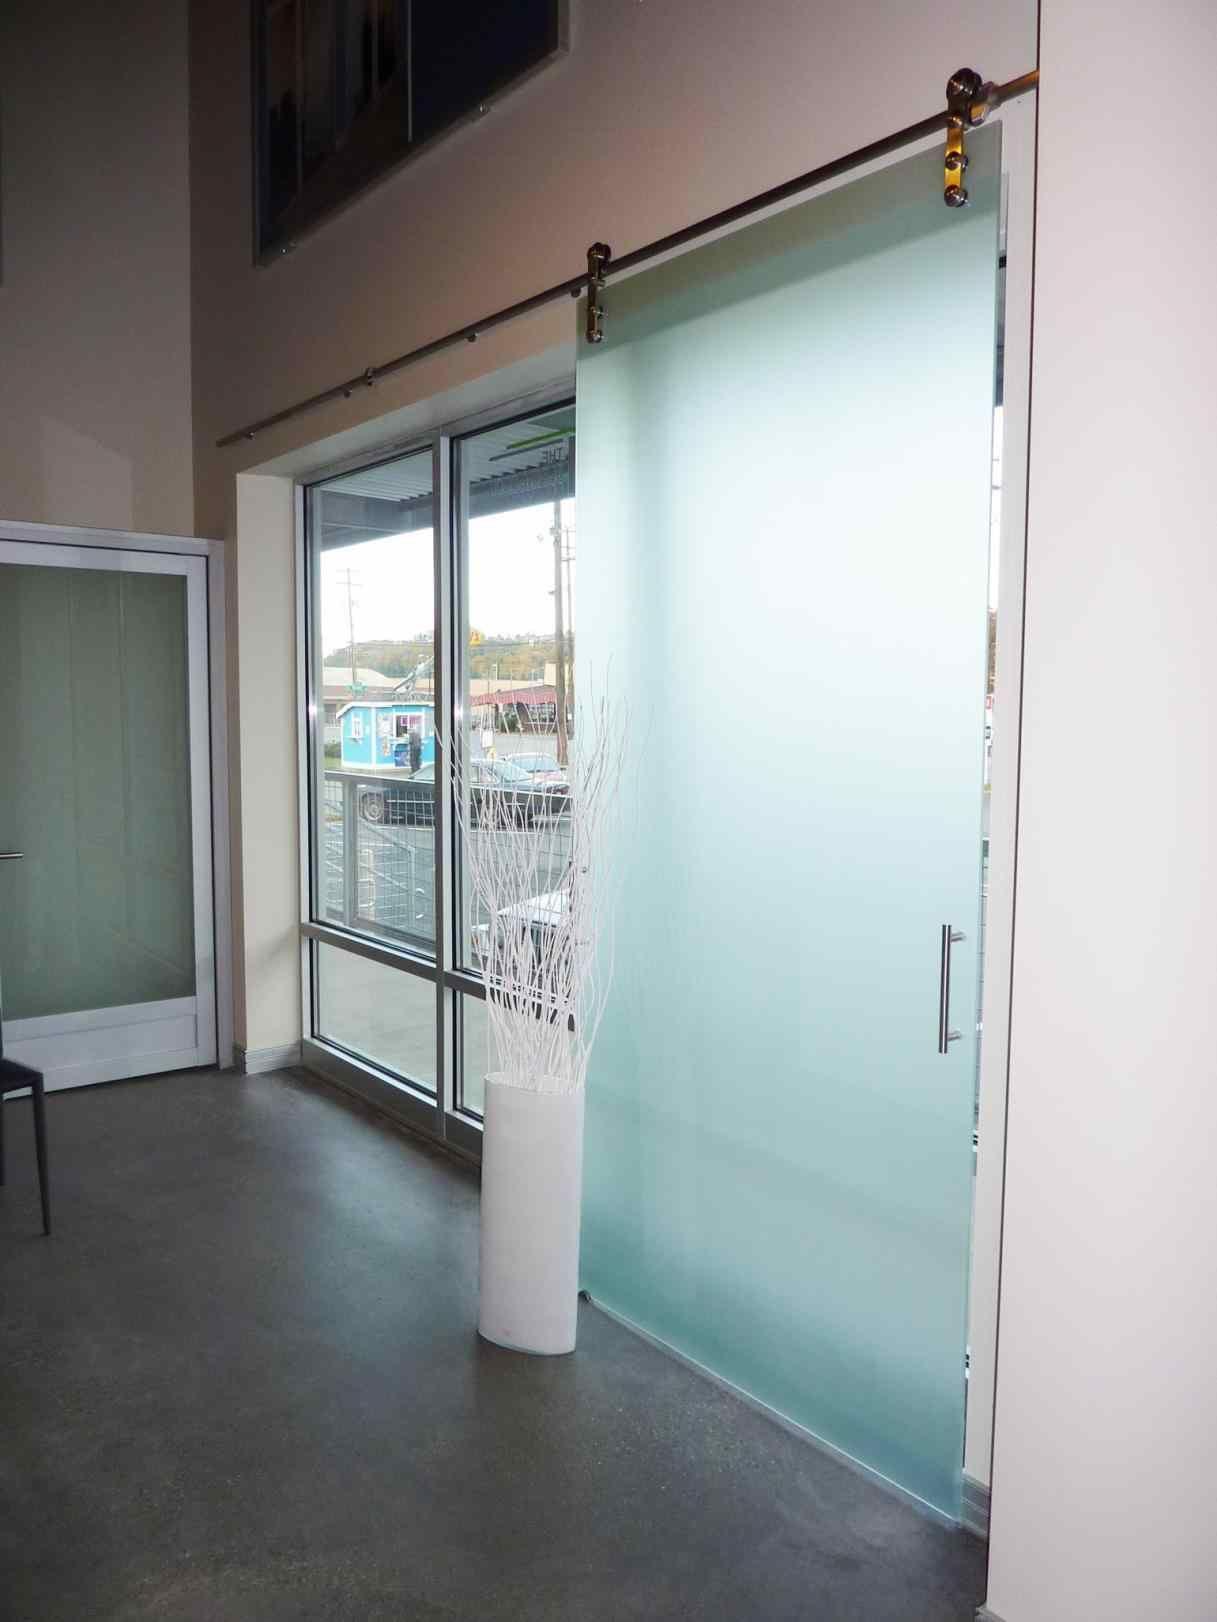 Bar Glass Door Locks Lowes U Animadeco Lock Bar Install Security